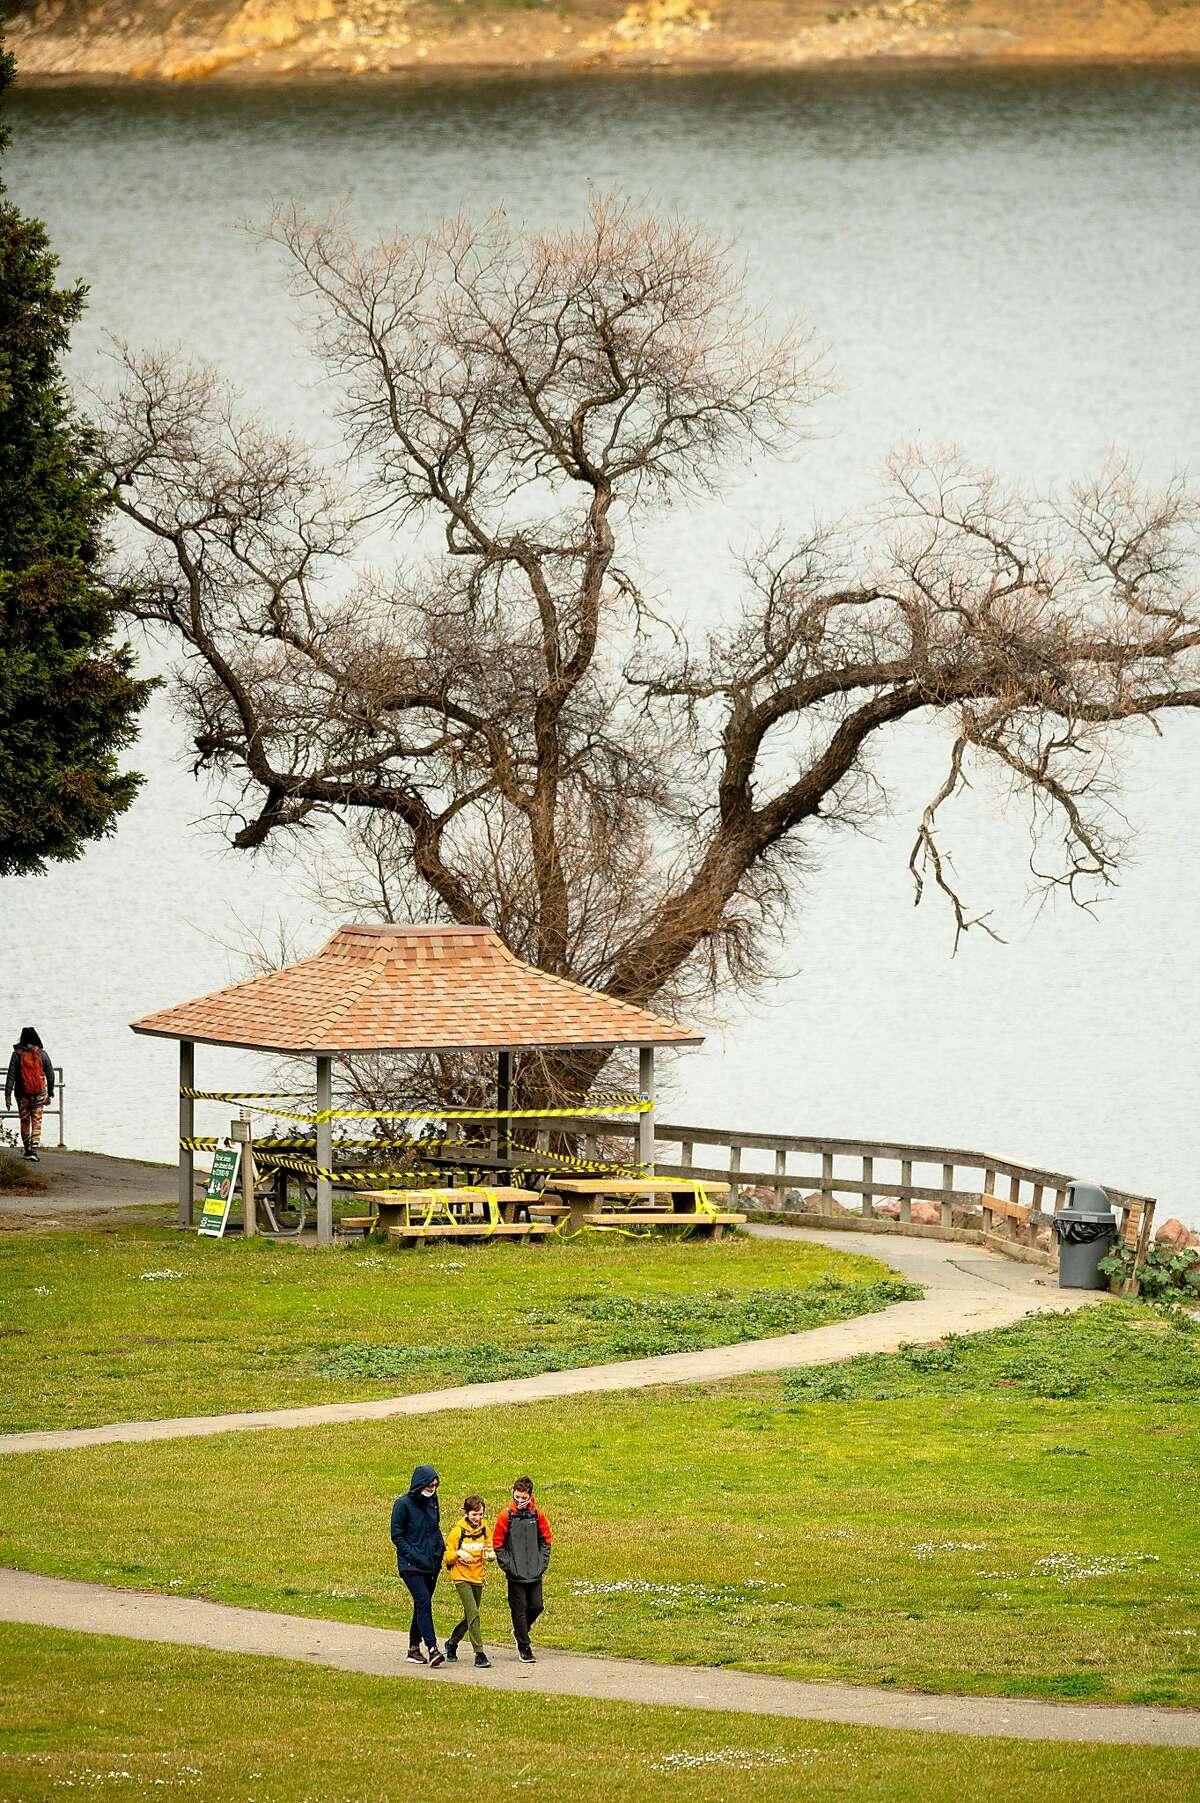 Visitors walk along a path at San Pablo Reservoir on Sunday, Feb. 14, 2021, in El Sobrante, Calif.